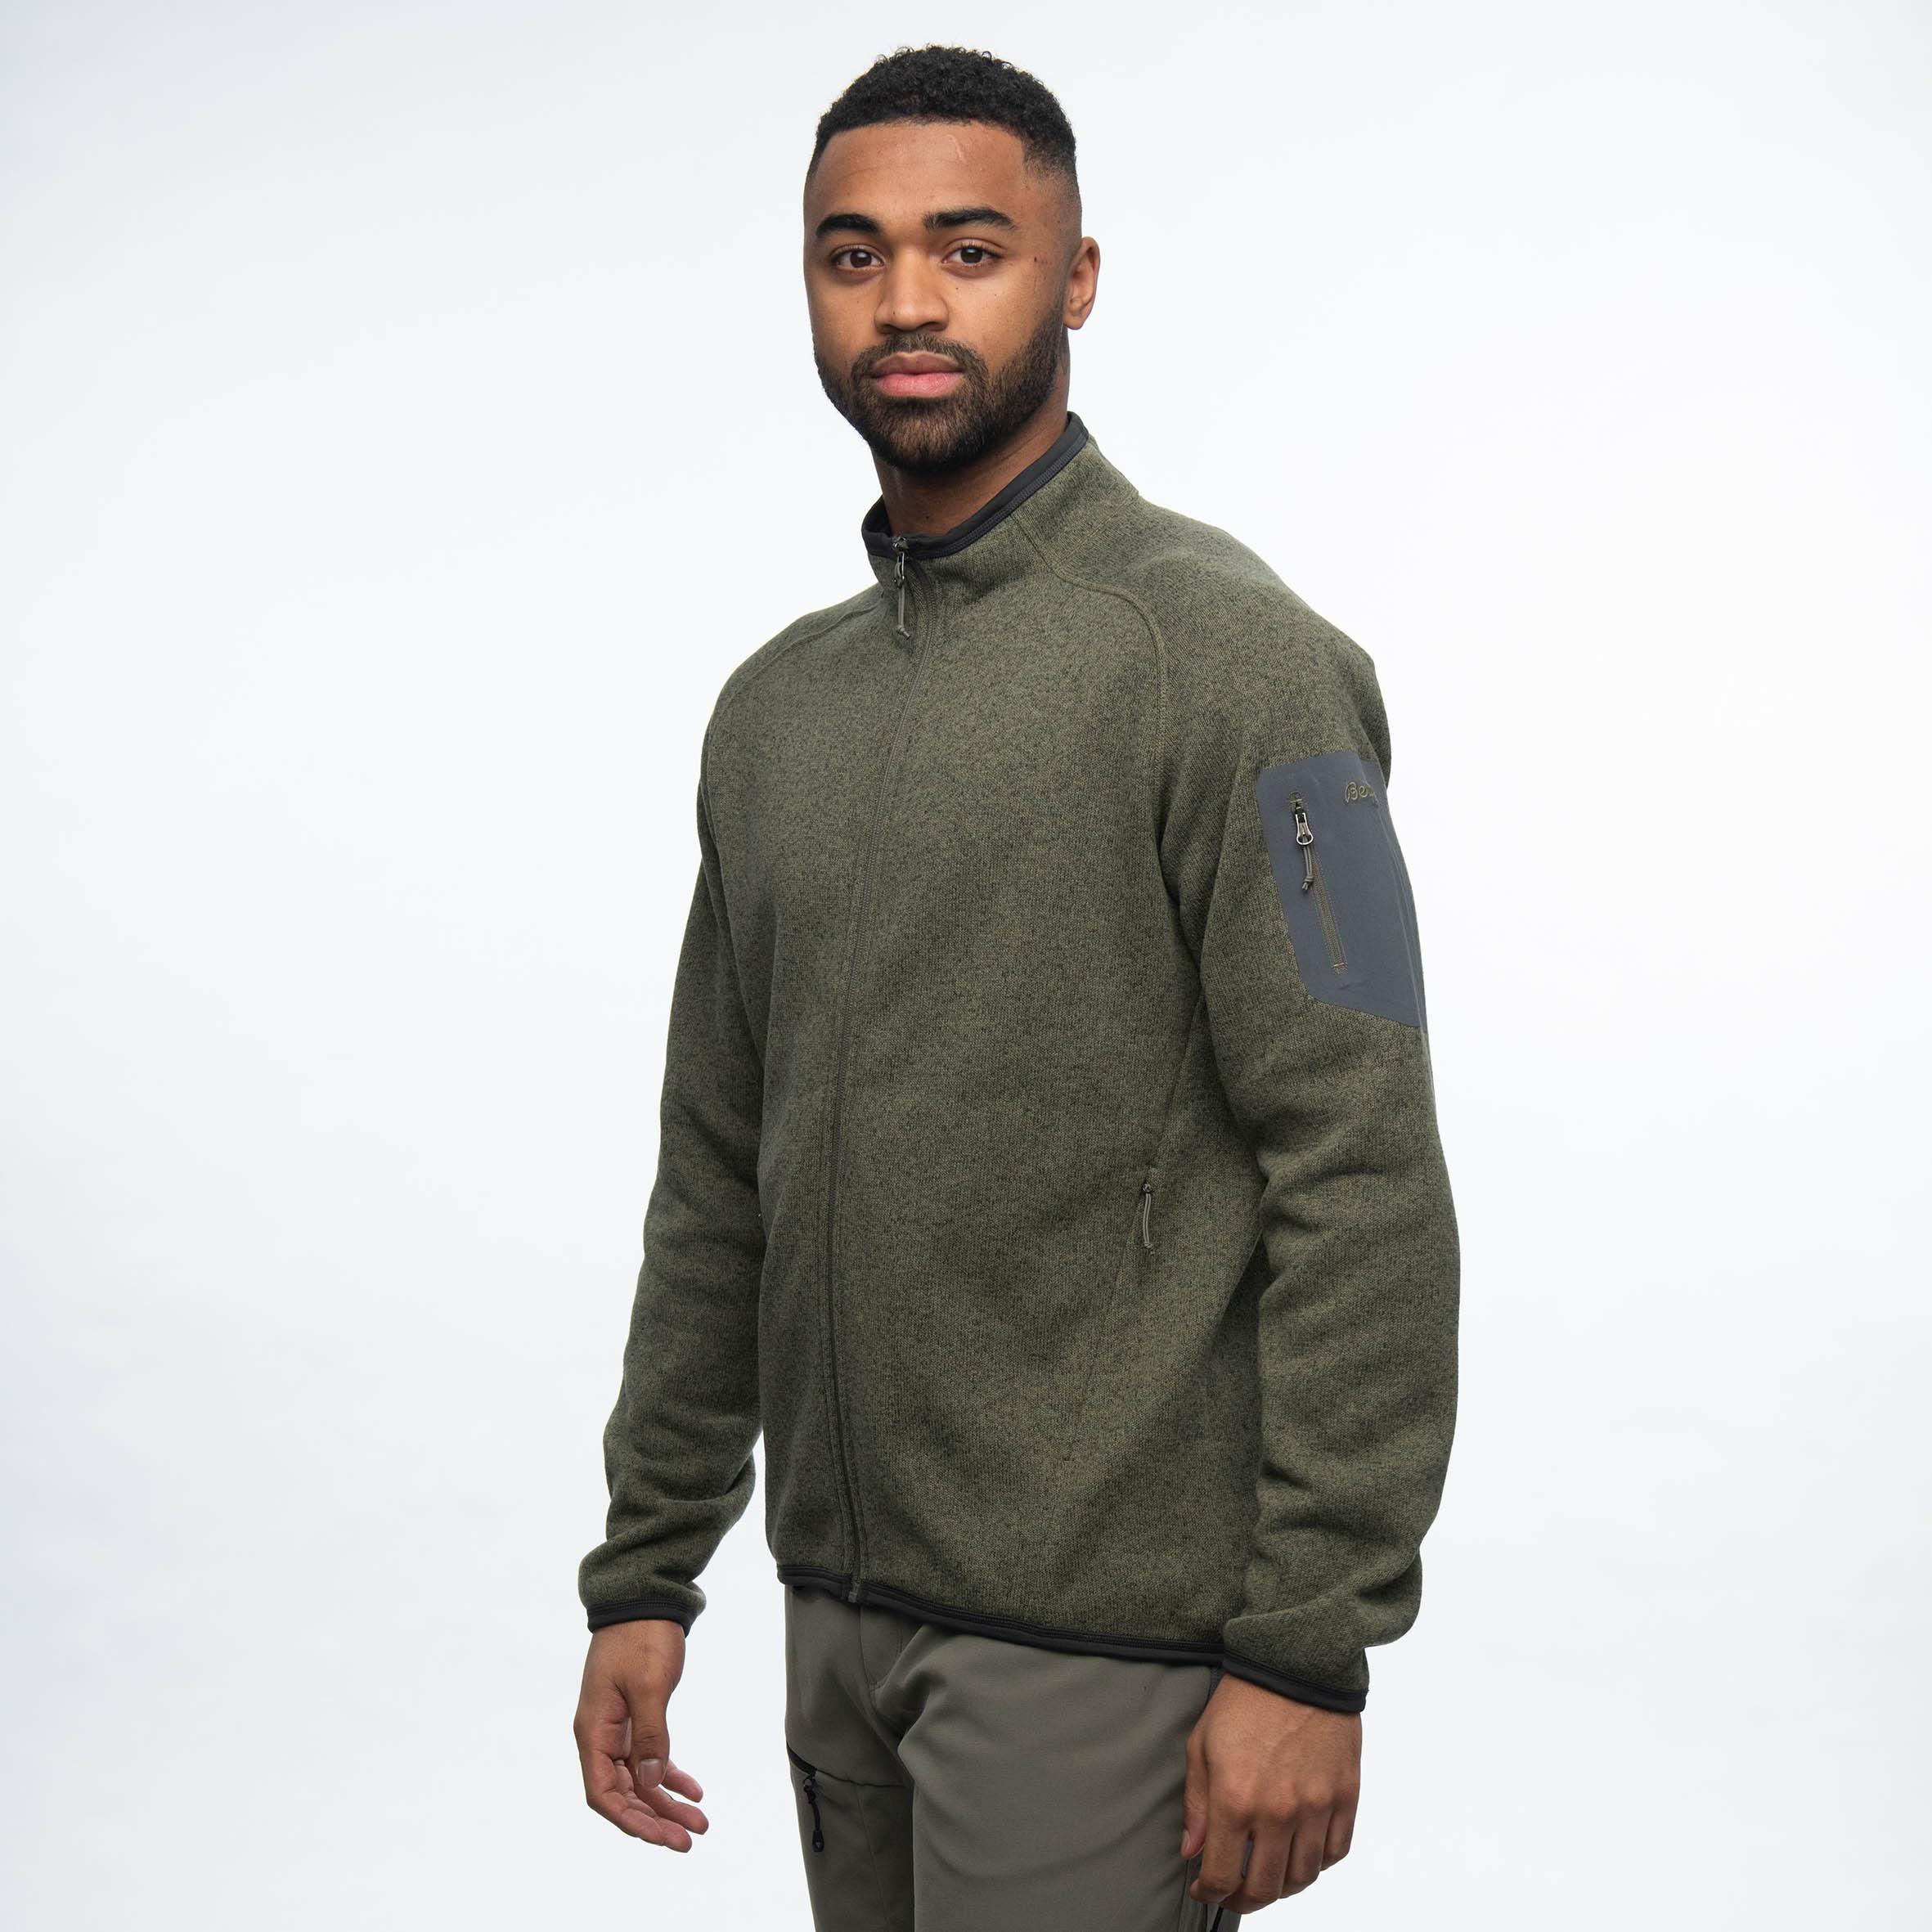 Kamphaug Knitted Jacket